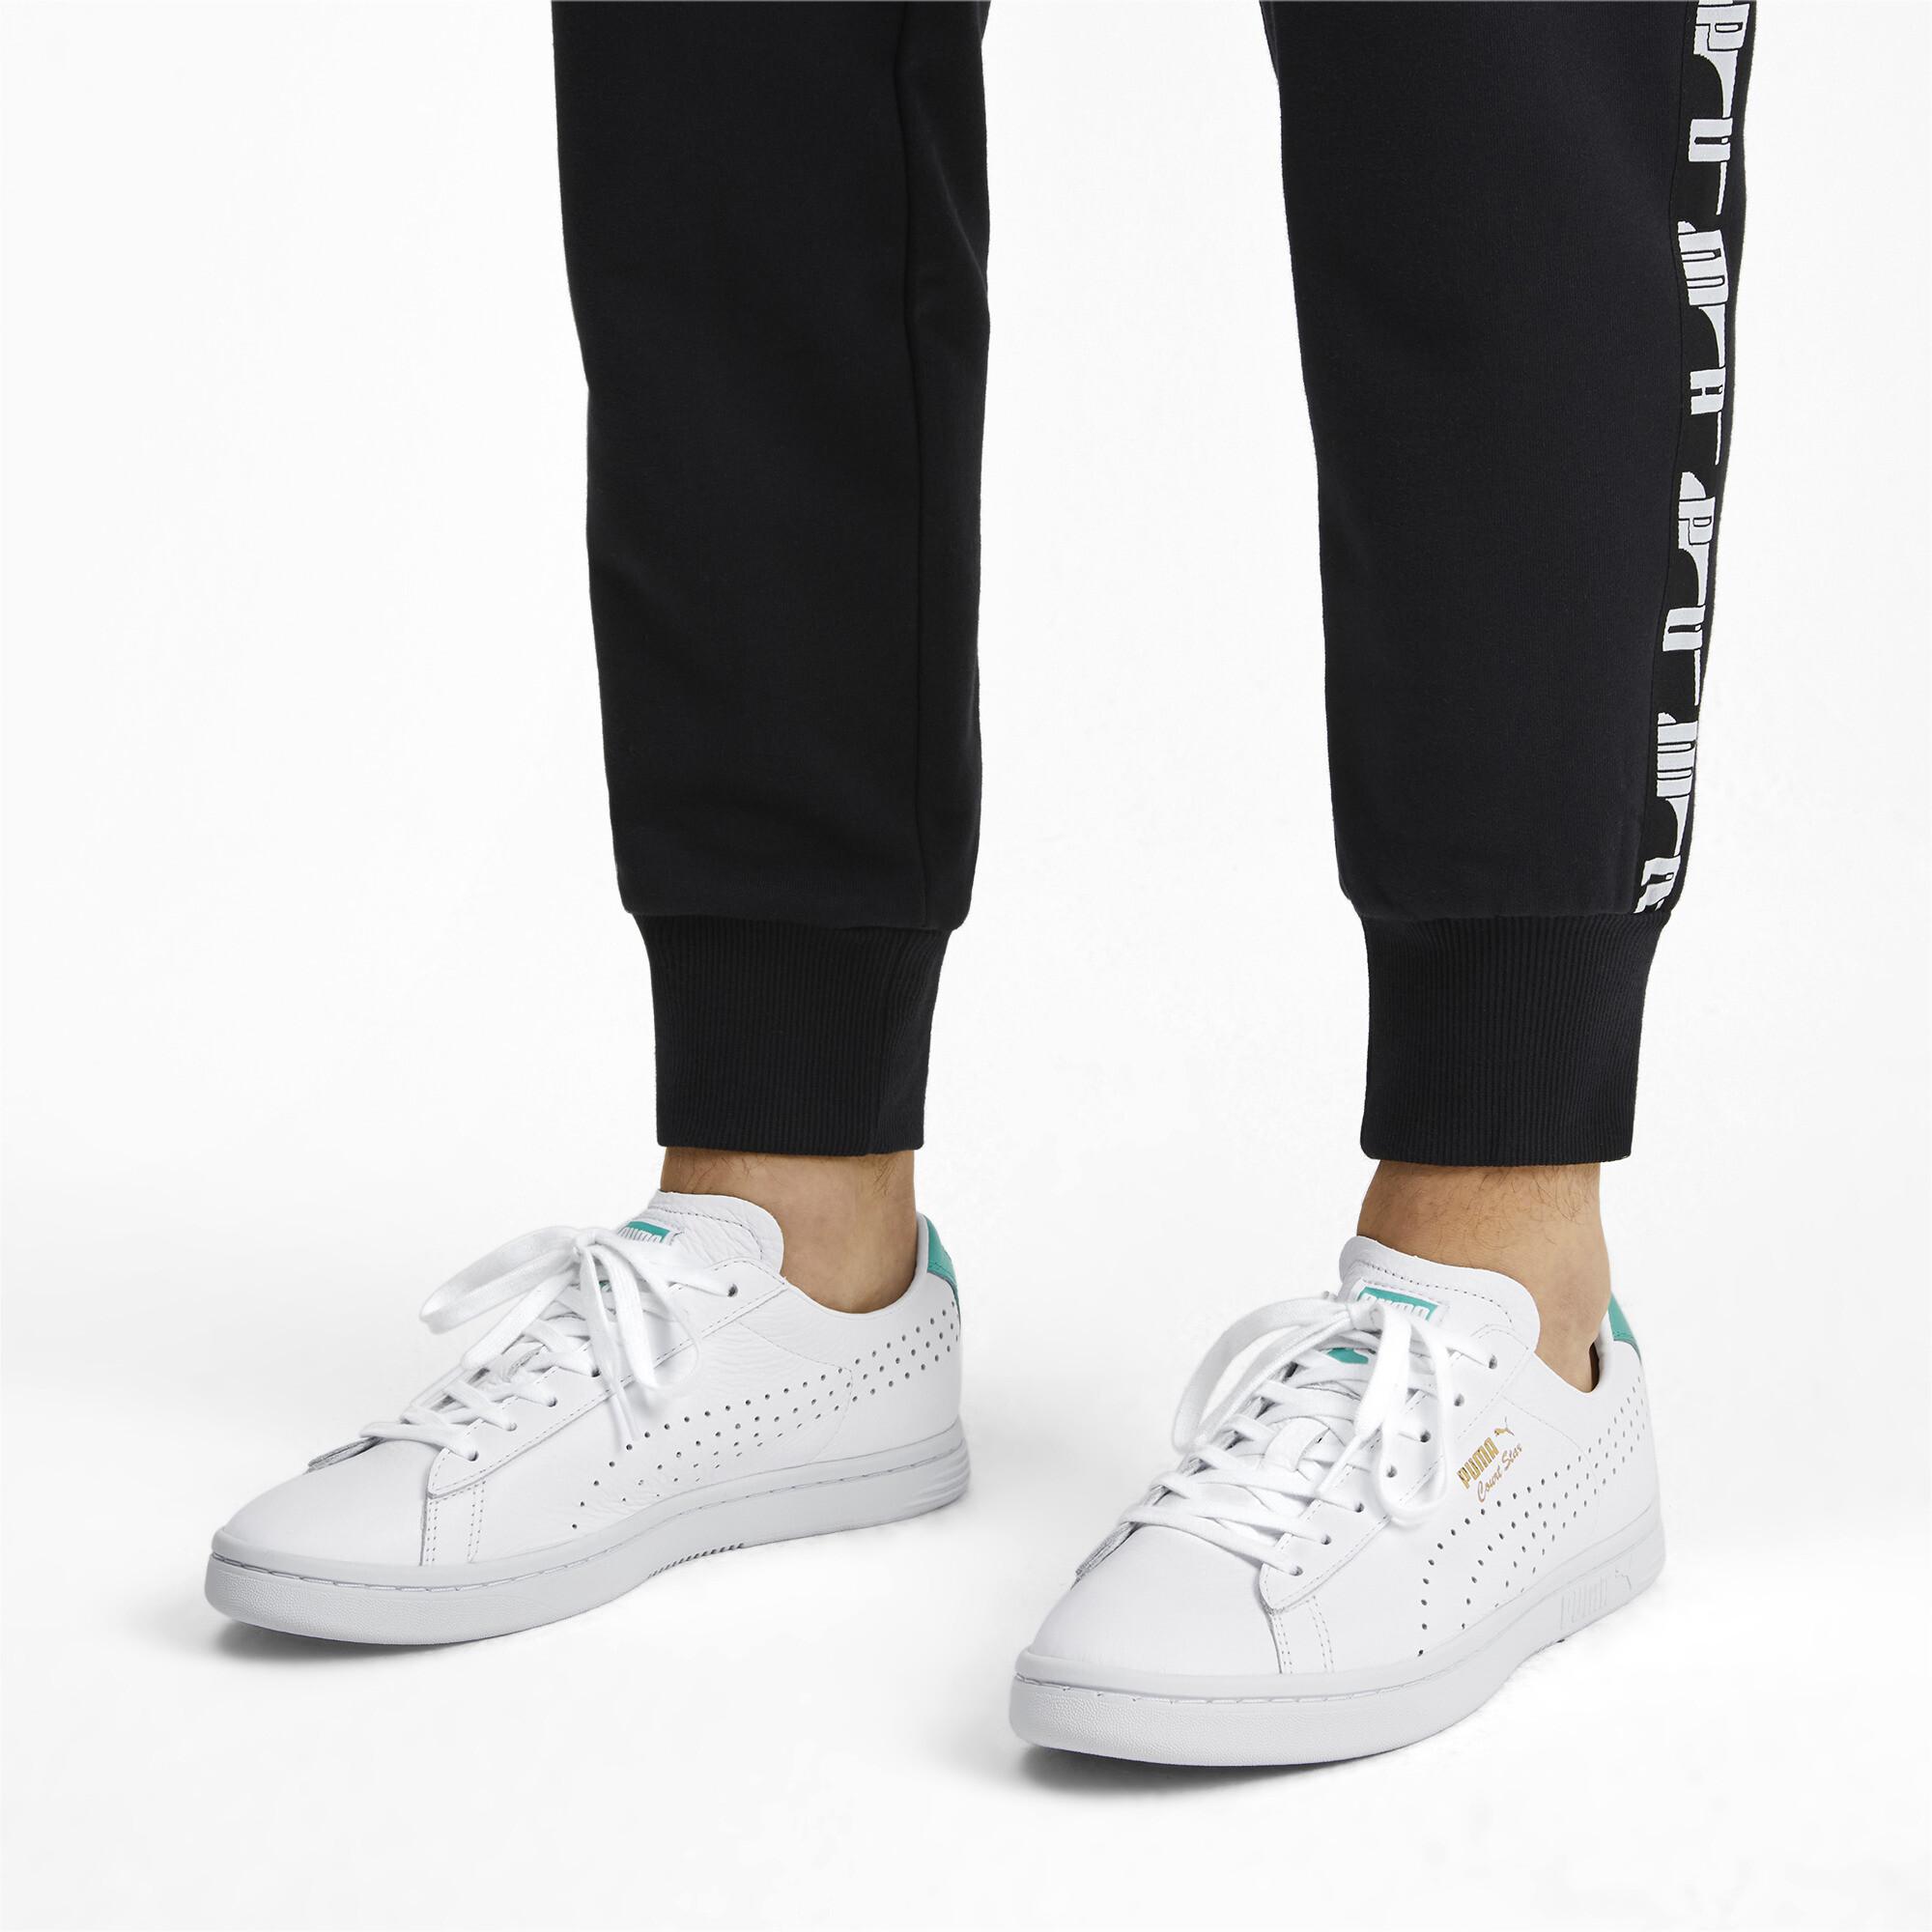 PUMA-Court-Star-Men-039-s-Sneakers-Unisex-Shoe-Sport-Classics thumbnail 5